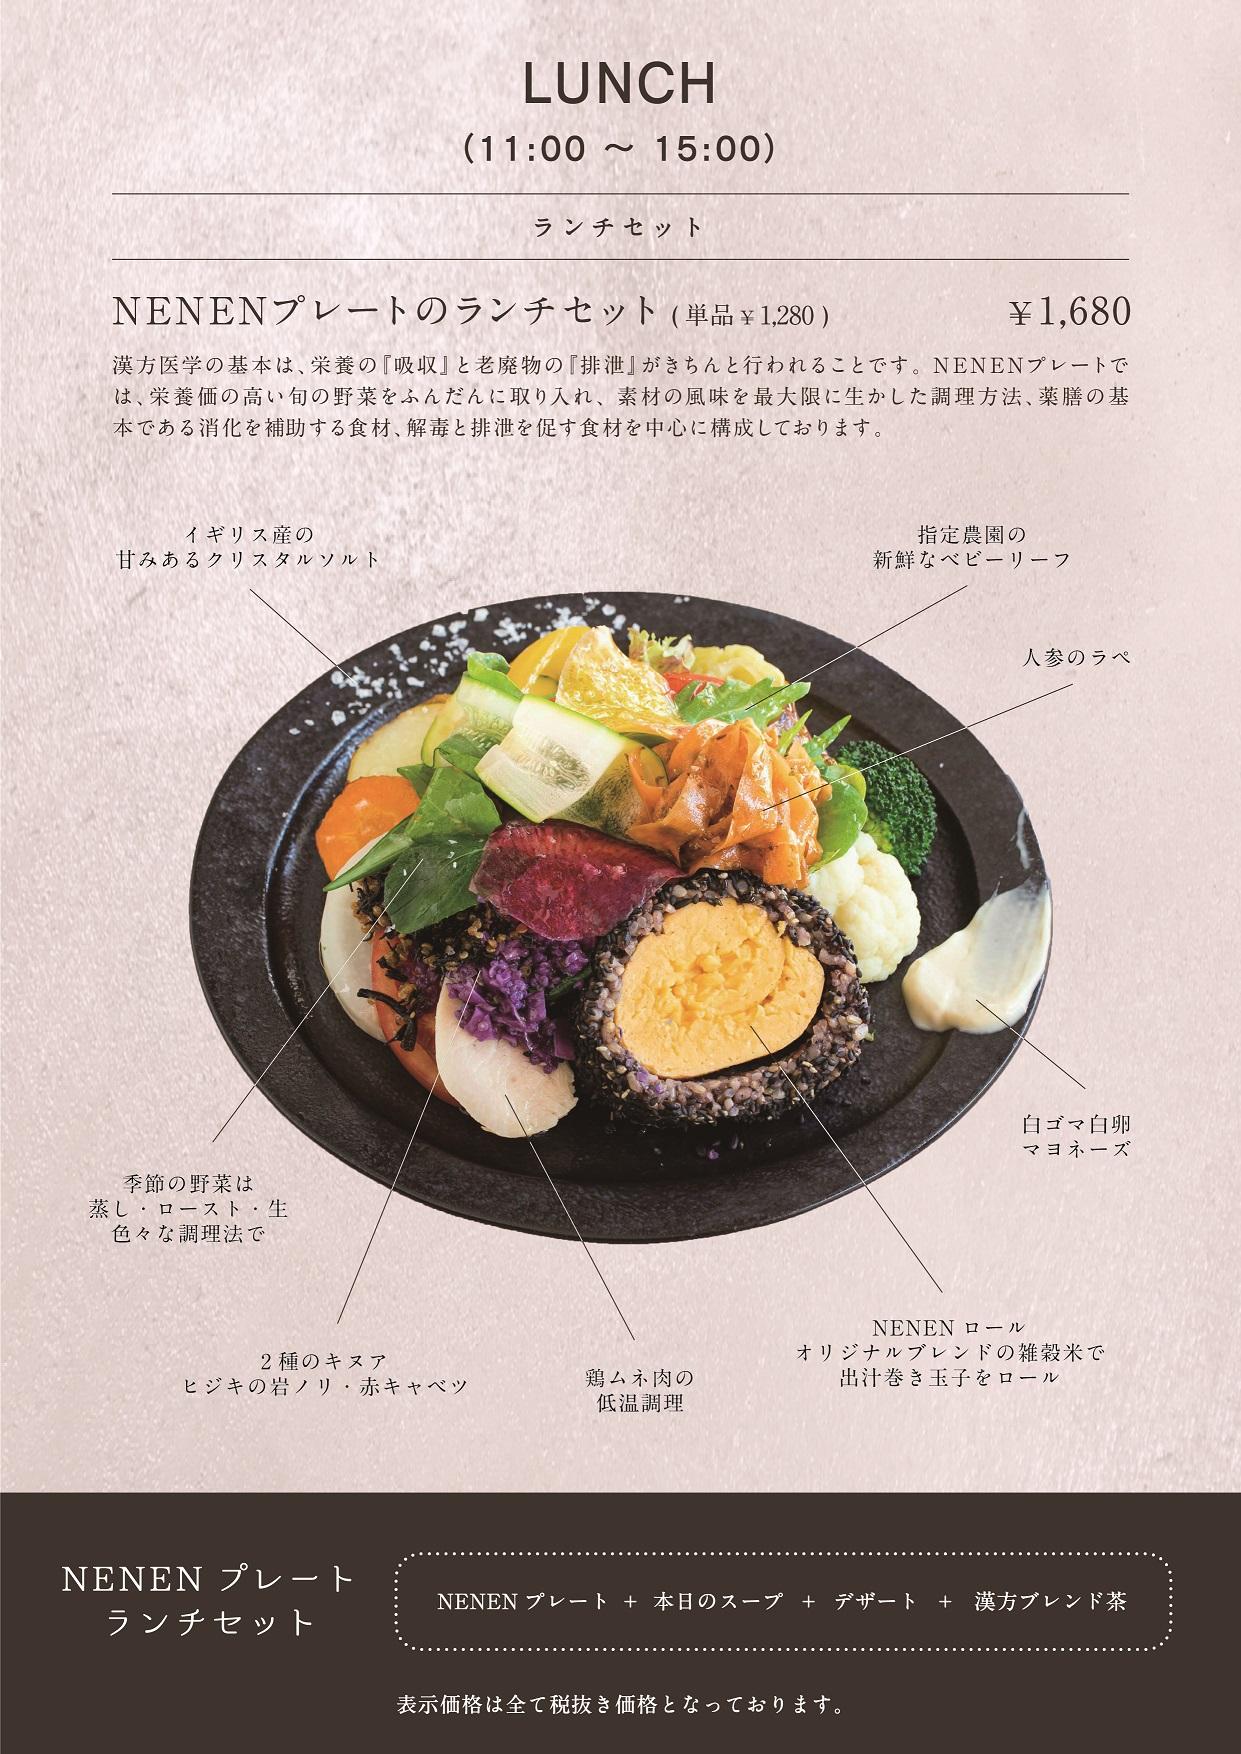 【NEW!!】menu information